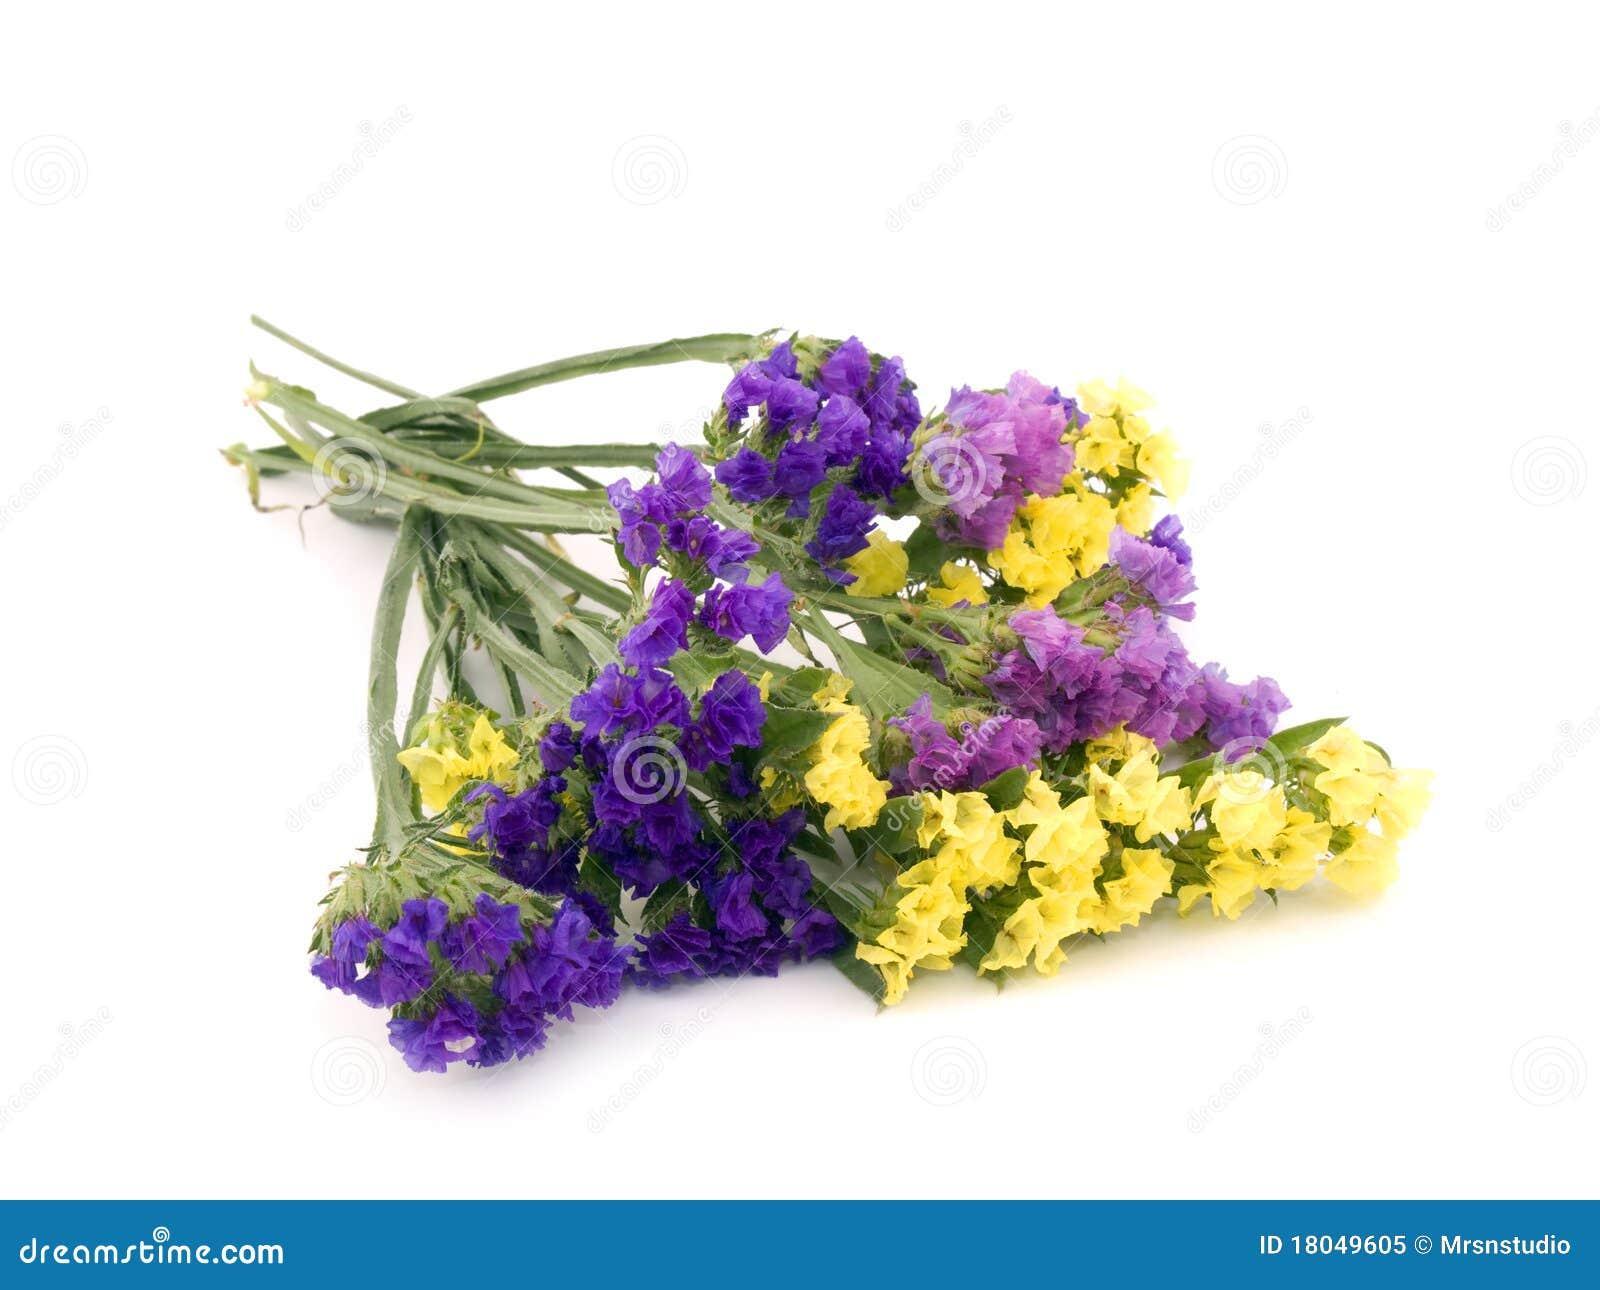 Statice Flowers Limonium Sinuatum Royalty Free Stock Image